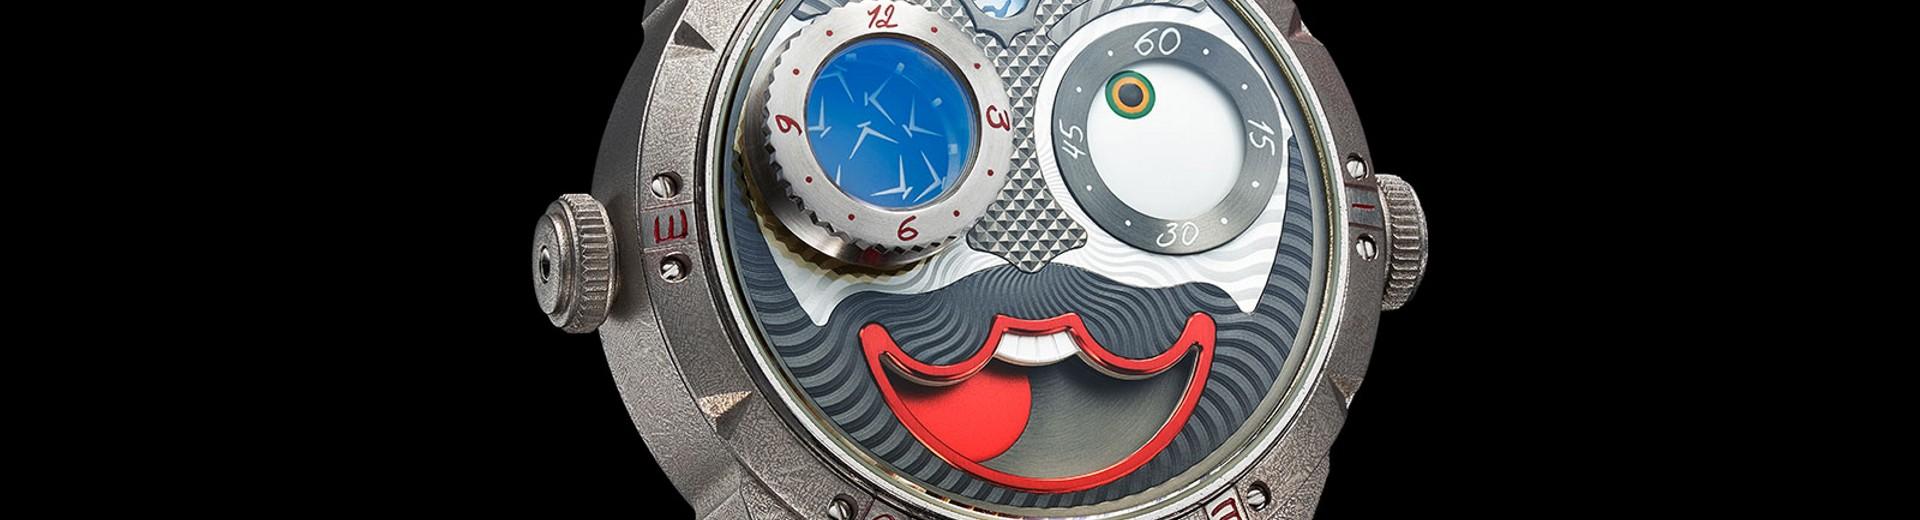 <span>Дизайнерские часы</span>